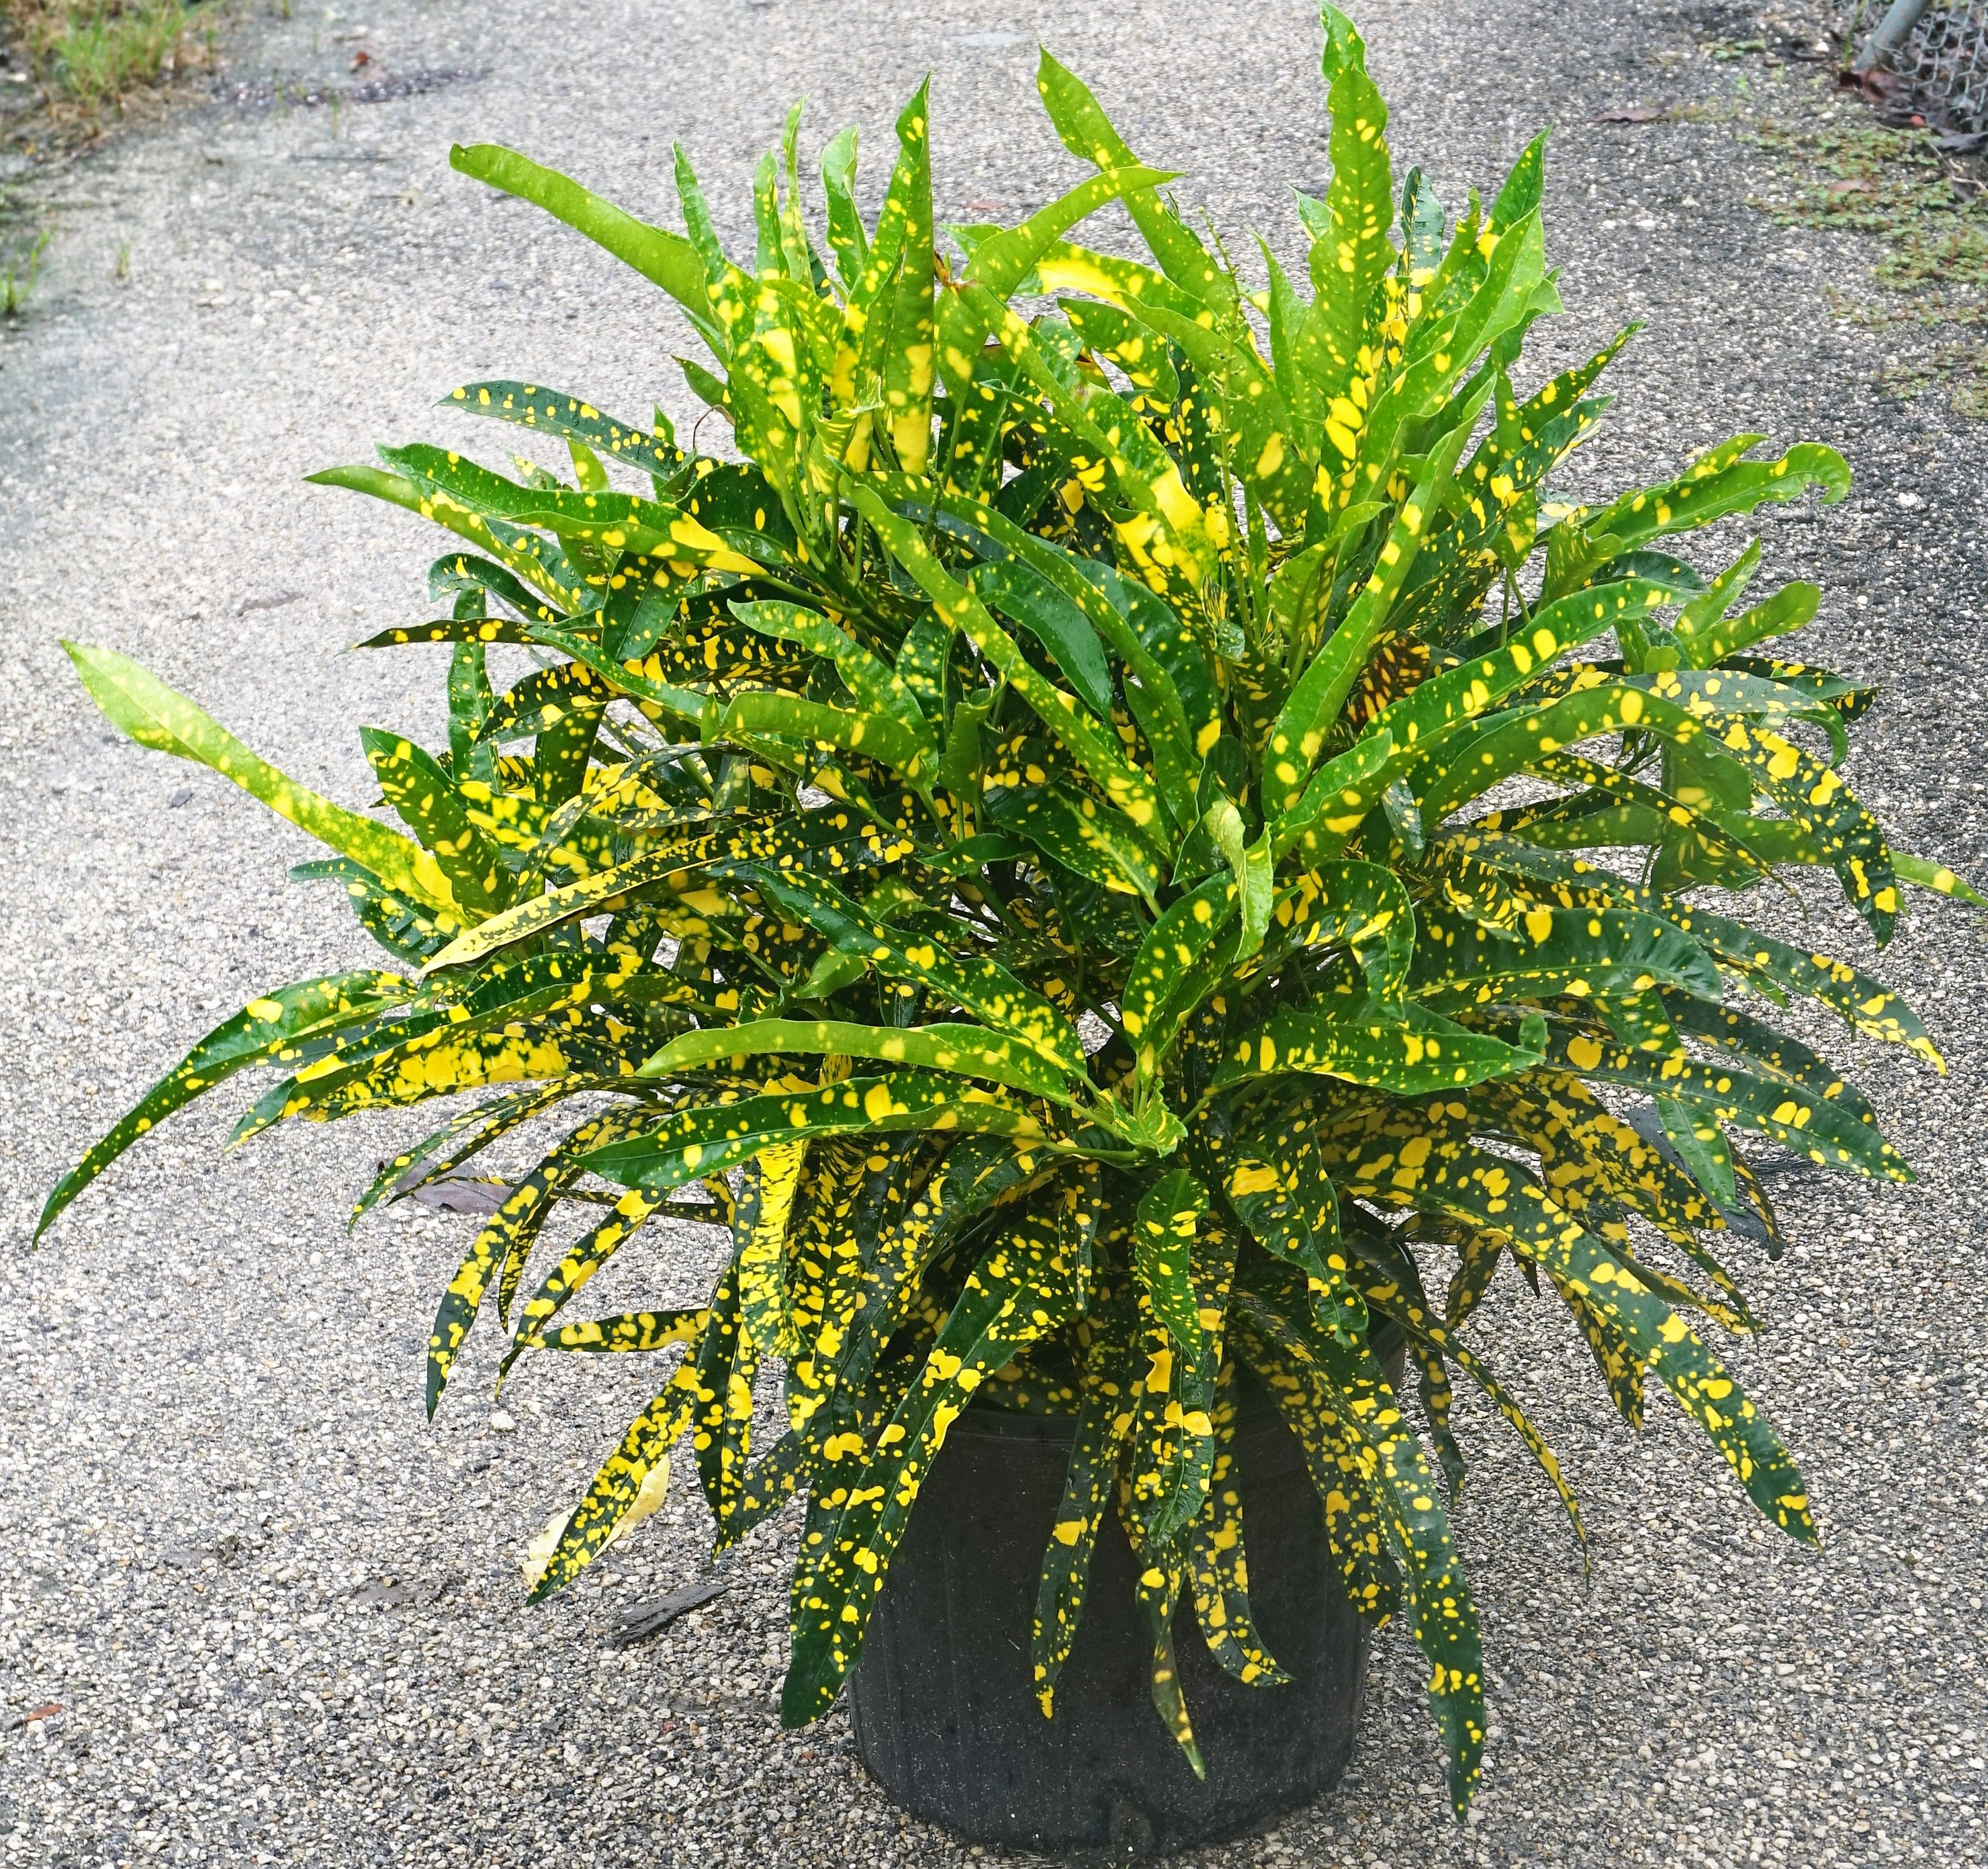 croton sloppy painter Plants, House plants, Florida plants